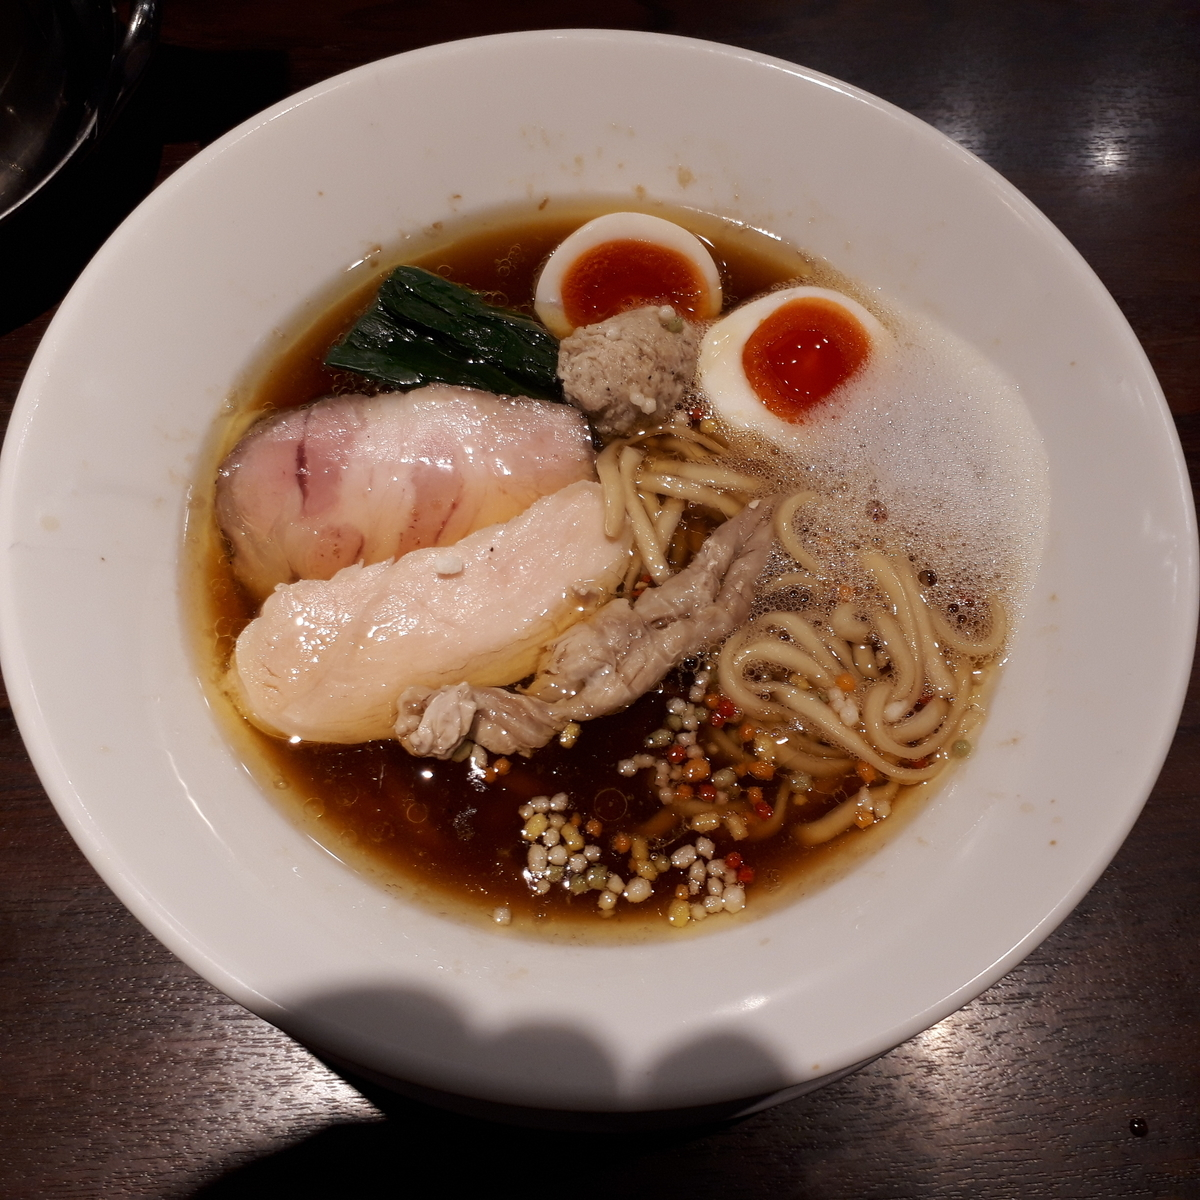 NAKAGAWAわず 路麺 味玉